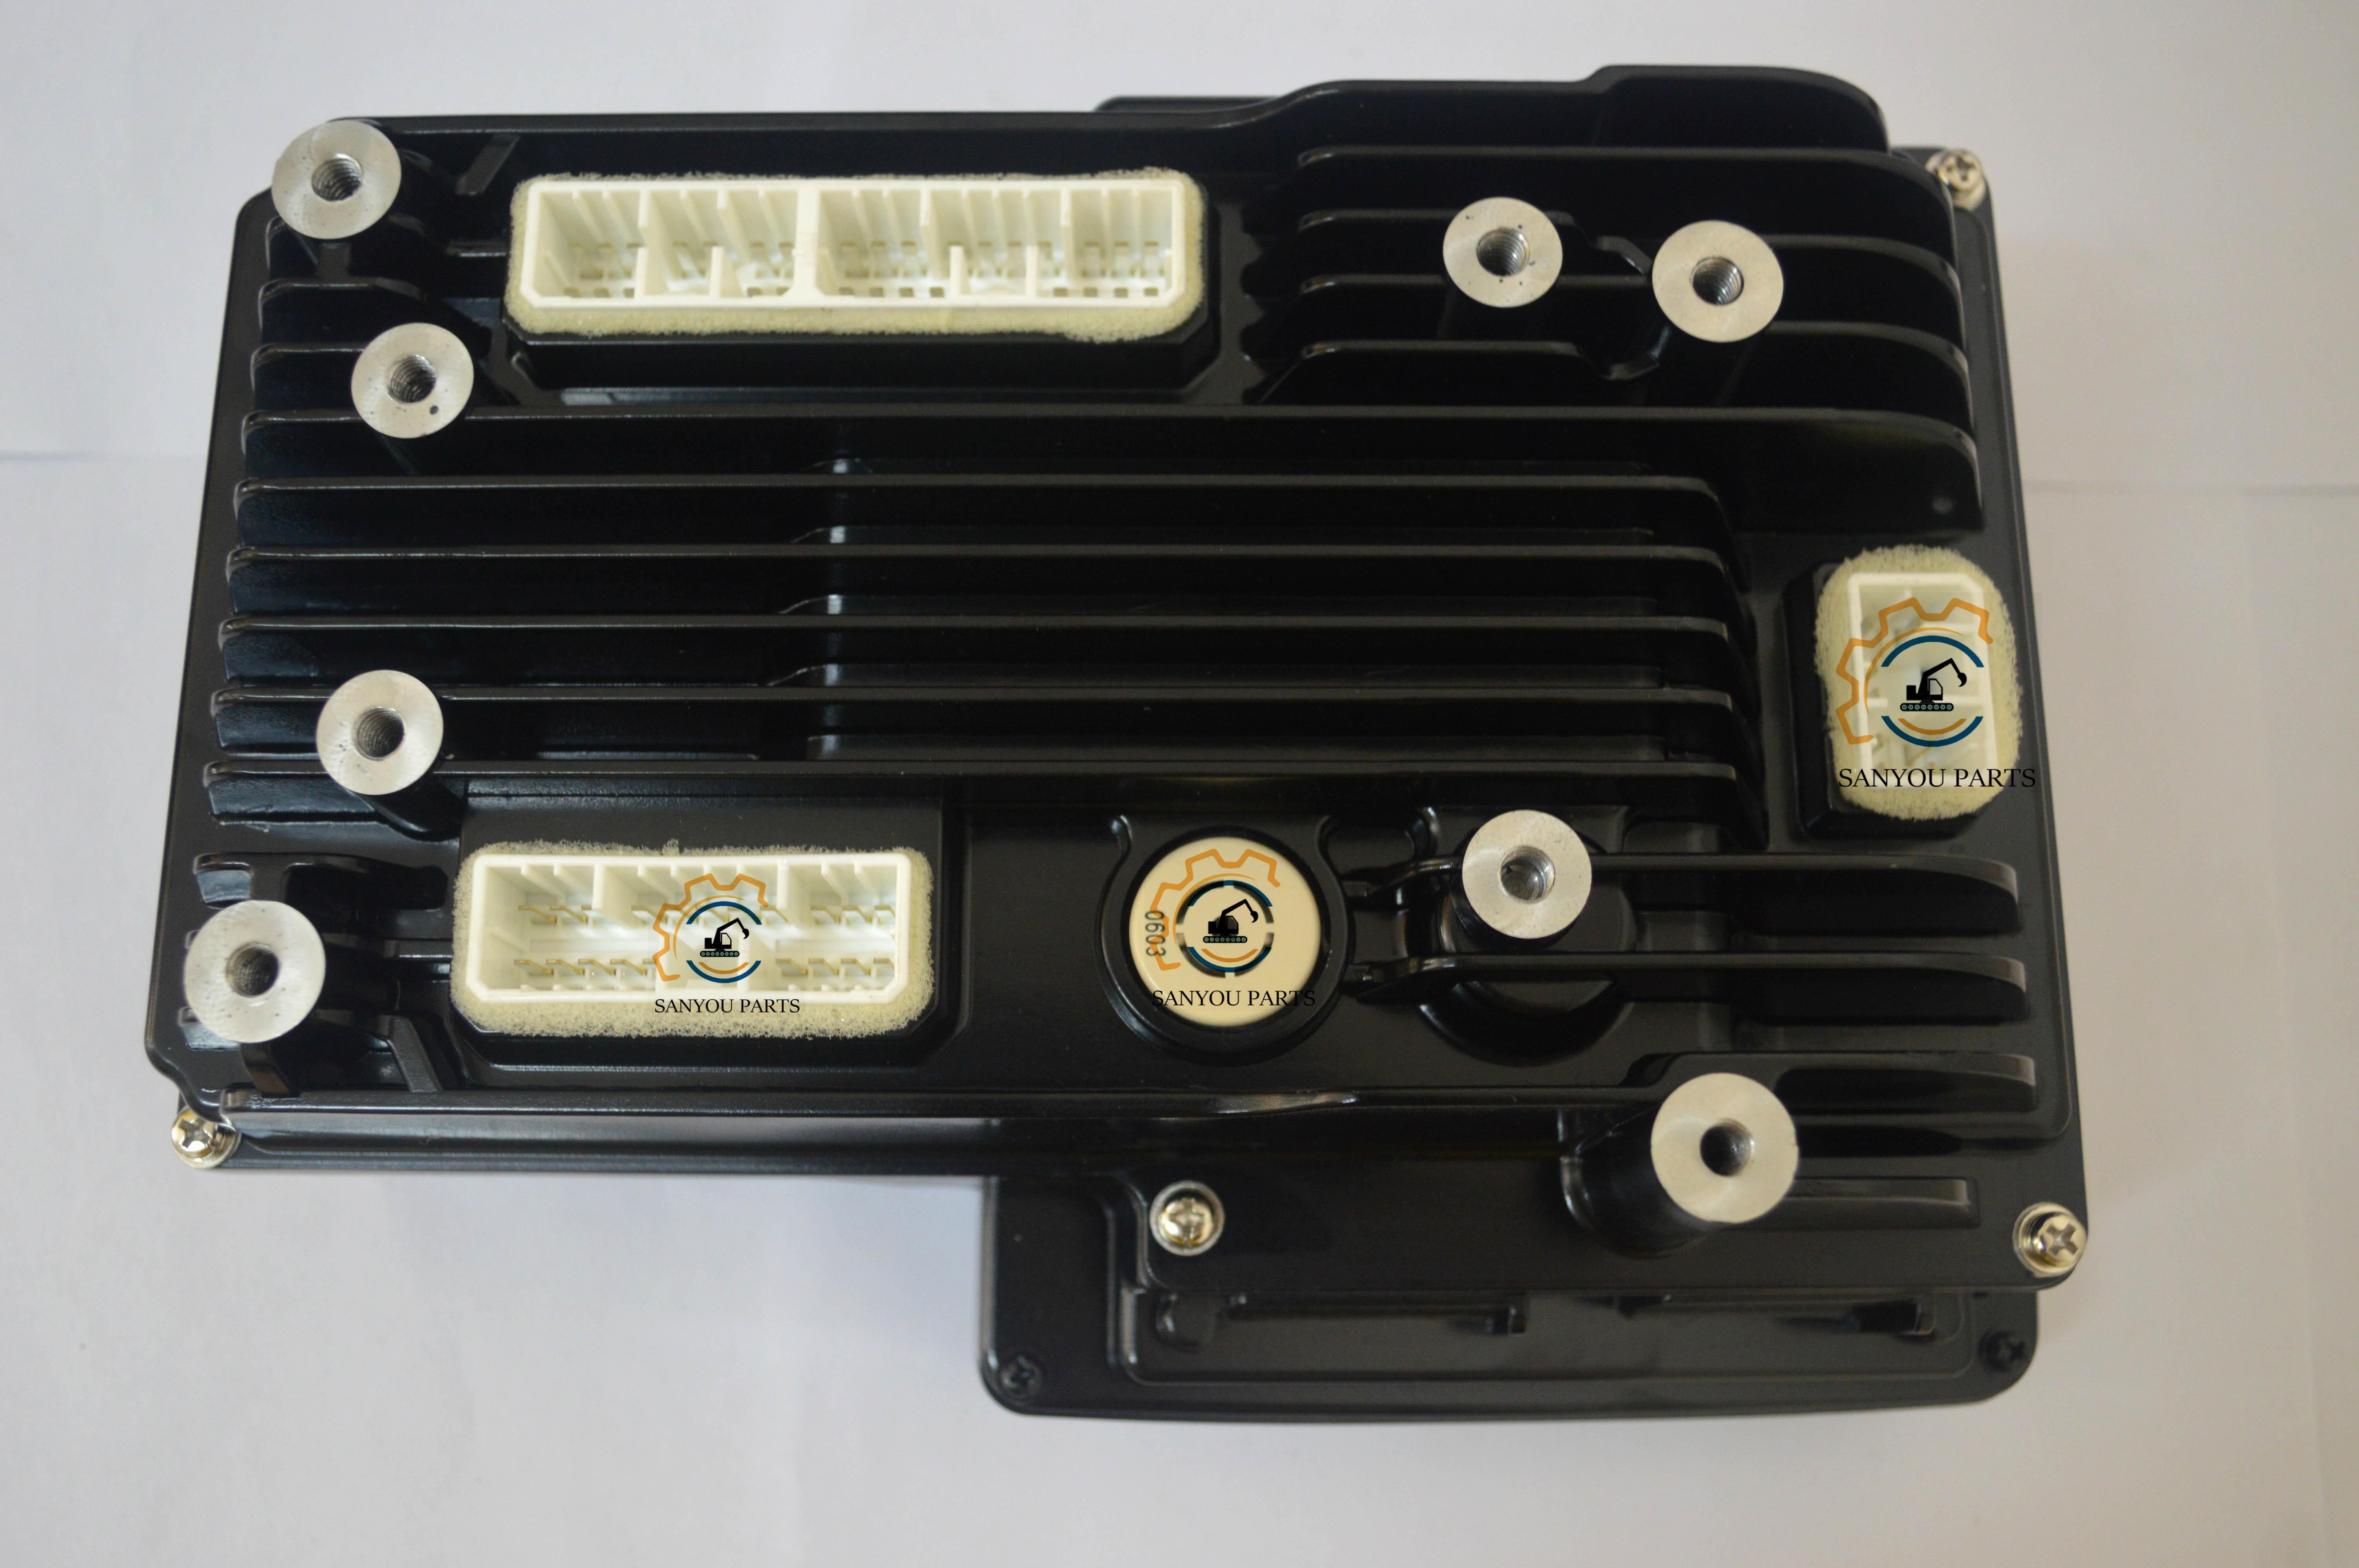 Komatsu Pc200 8 Monitor P No 7835 31 1004 Sanyou Parts Wiring Harness Mo Gauge